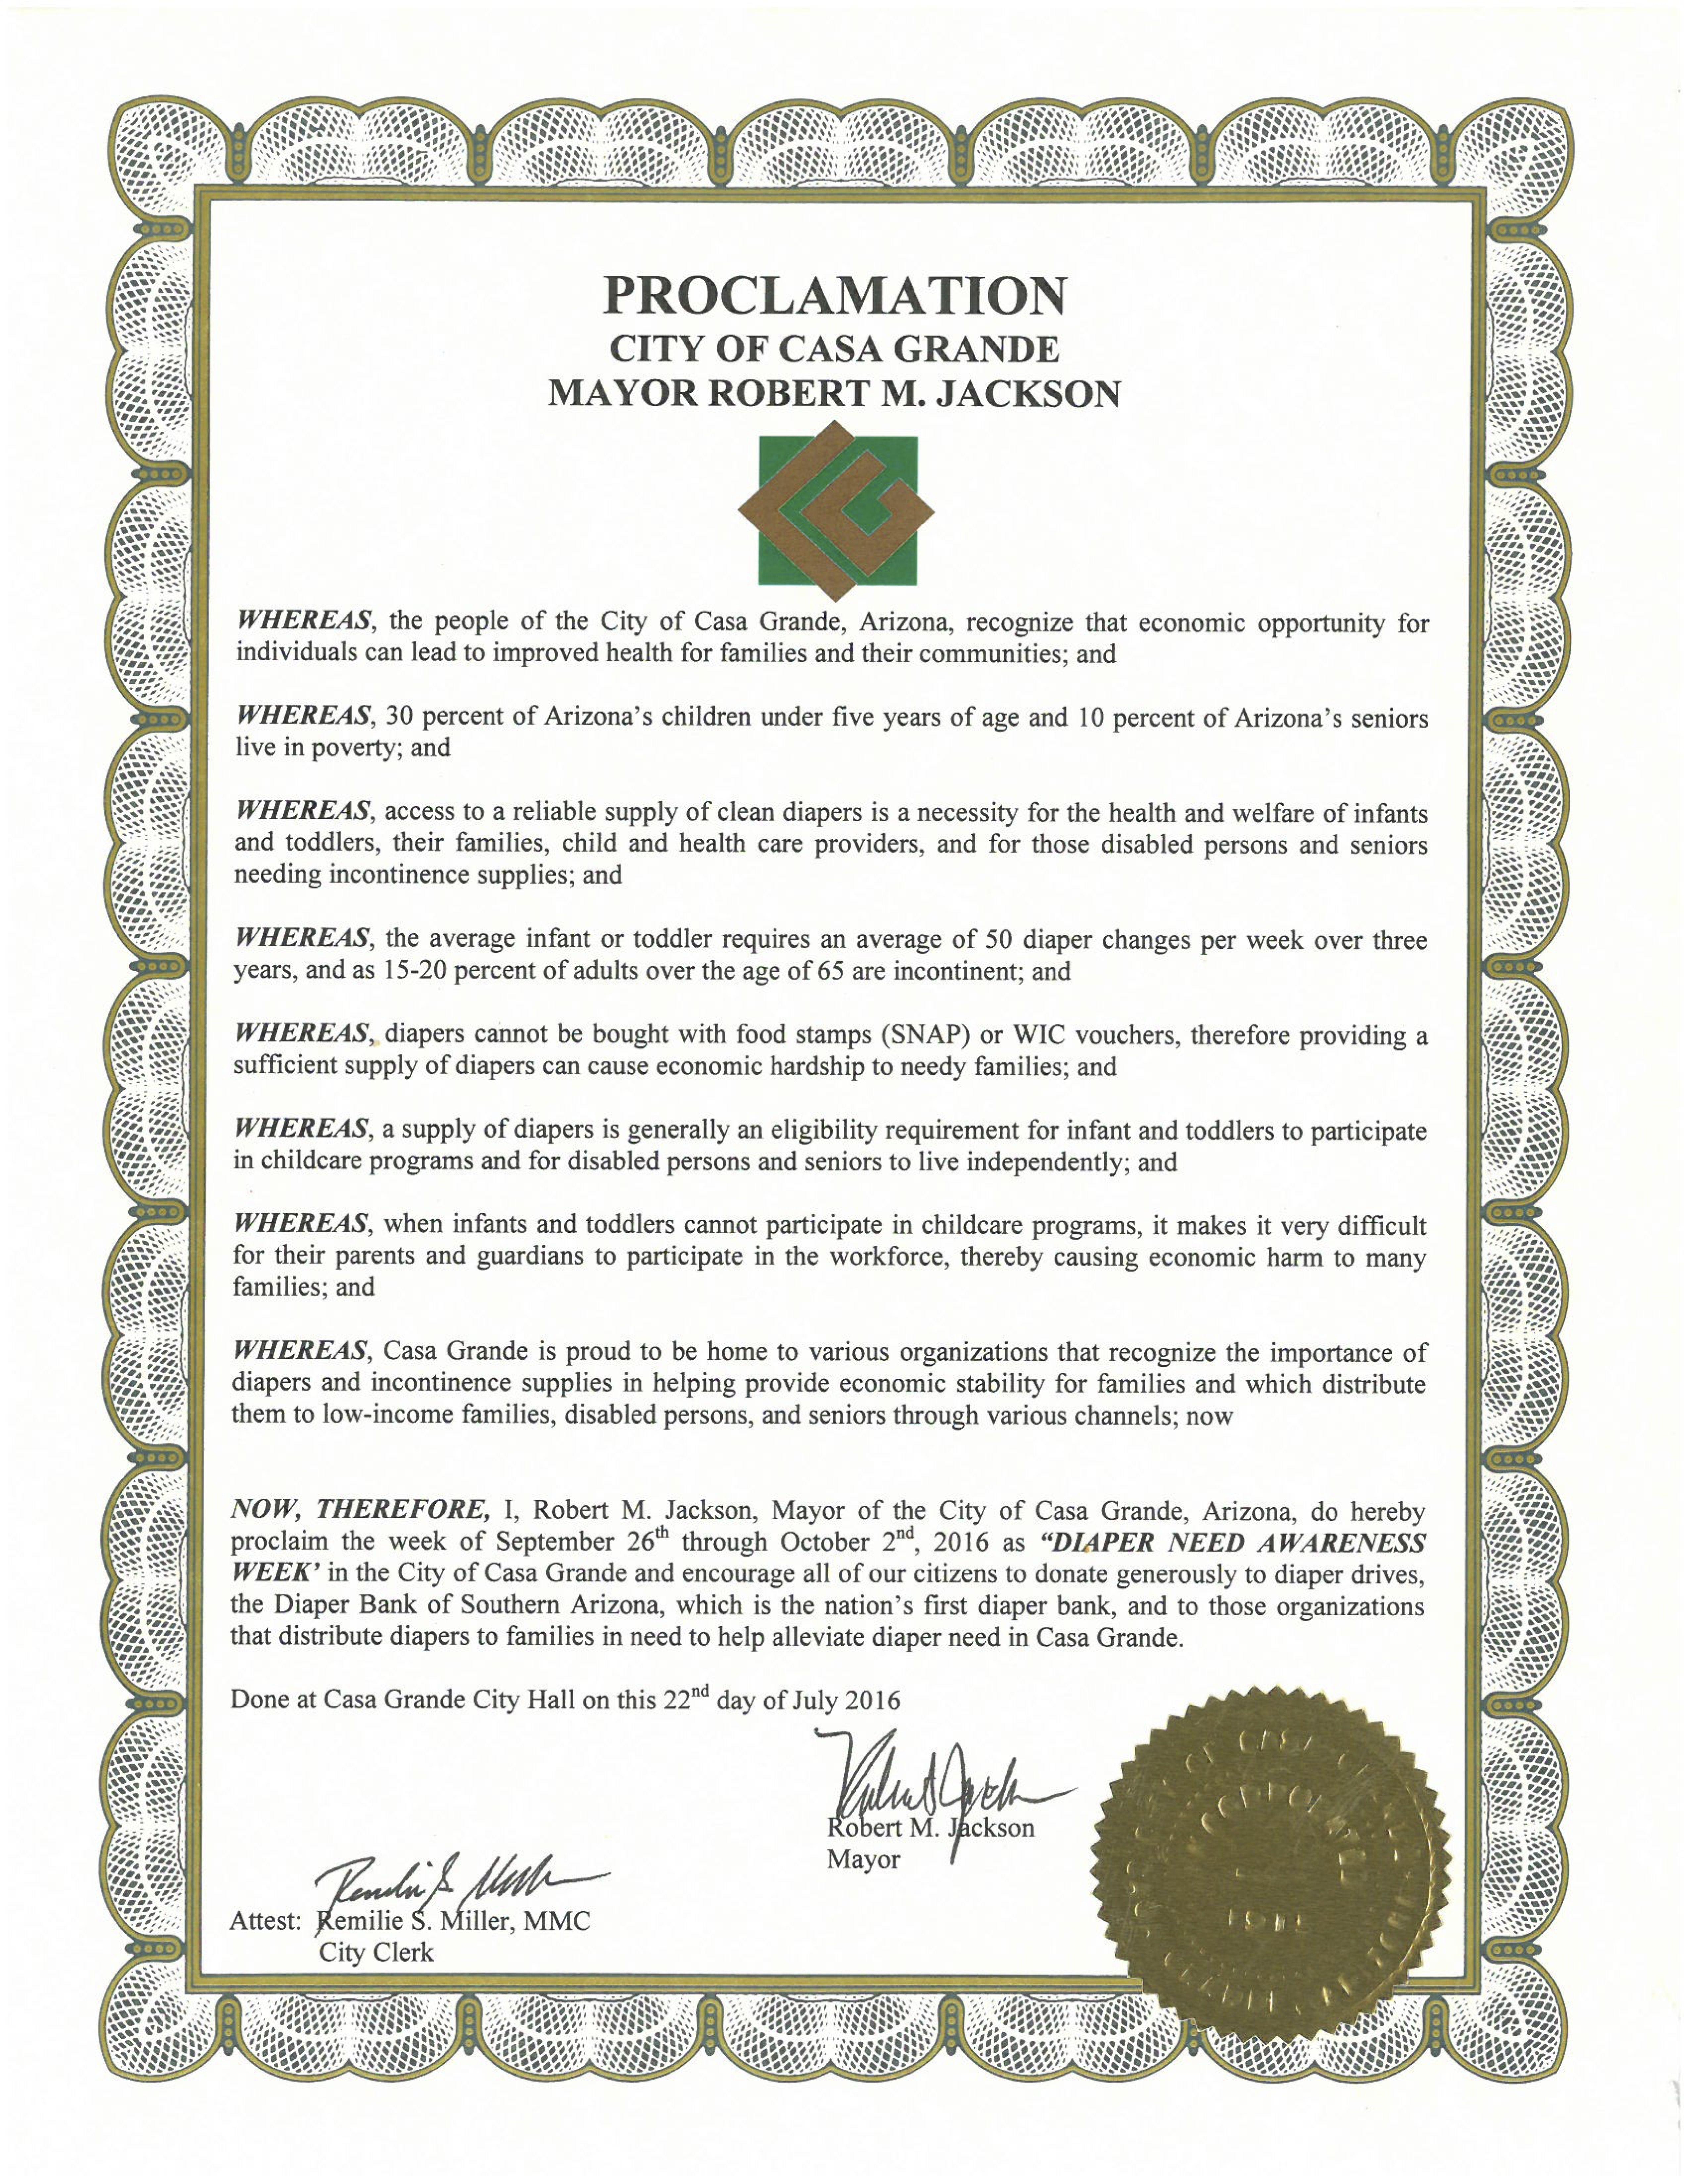 CASA GRANDE, AZ - - Mayoral proclamation recognizing Diaper Need Awareness Week (Sep. 26 - Oct. 2, 2016) #diaperneed diaperneed.org